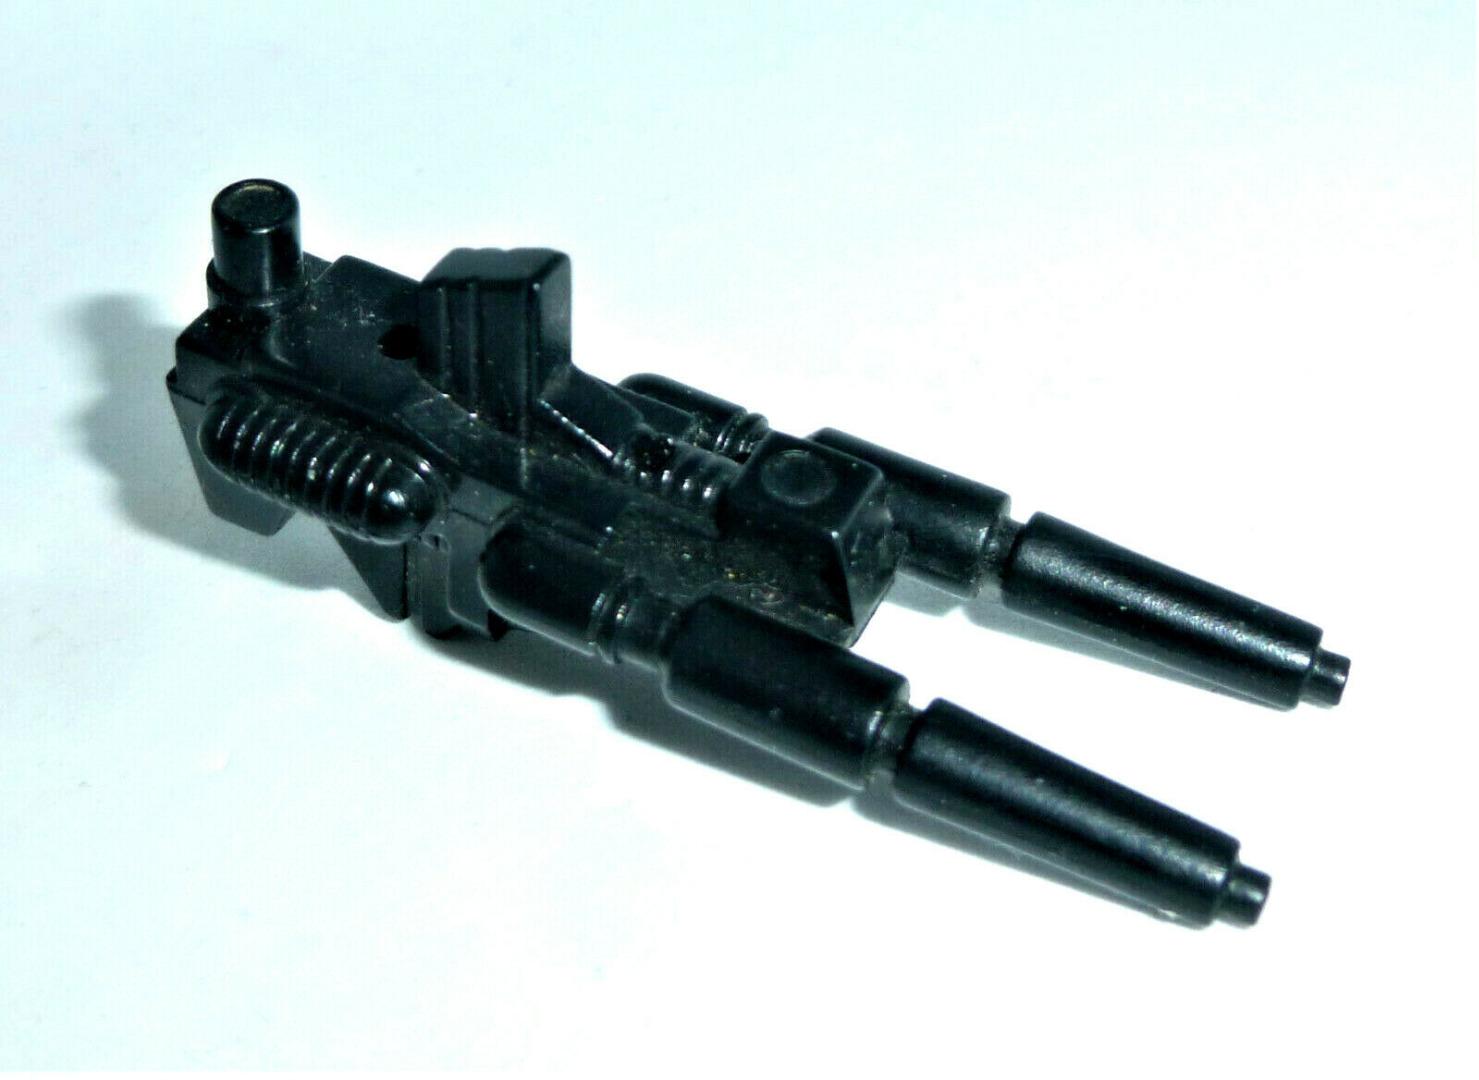 Grimlock Gun / Laser - Rifle G1 Transformers Vintage Hasbro 1985 Action Figure - 1